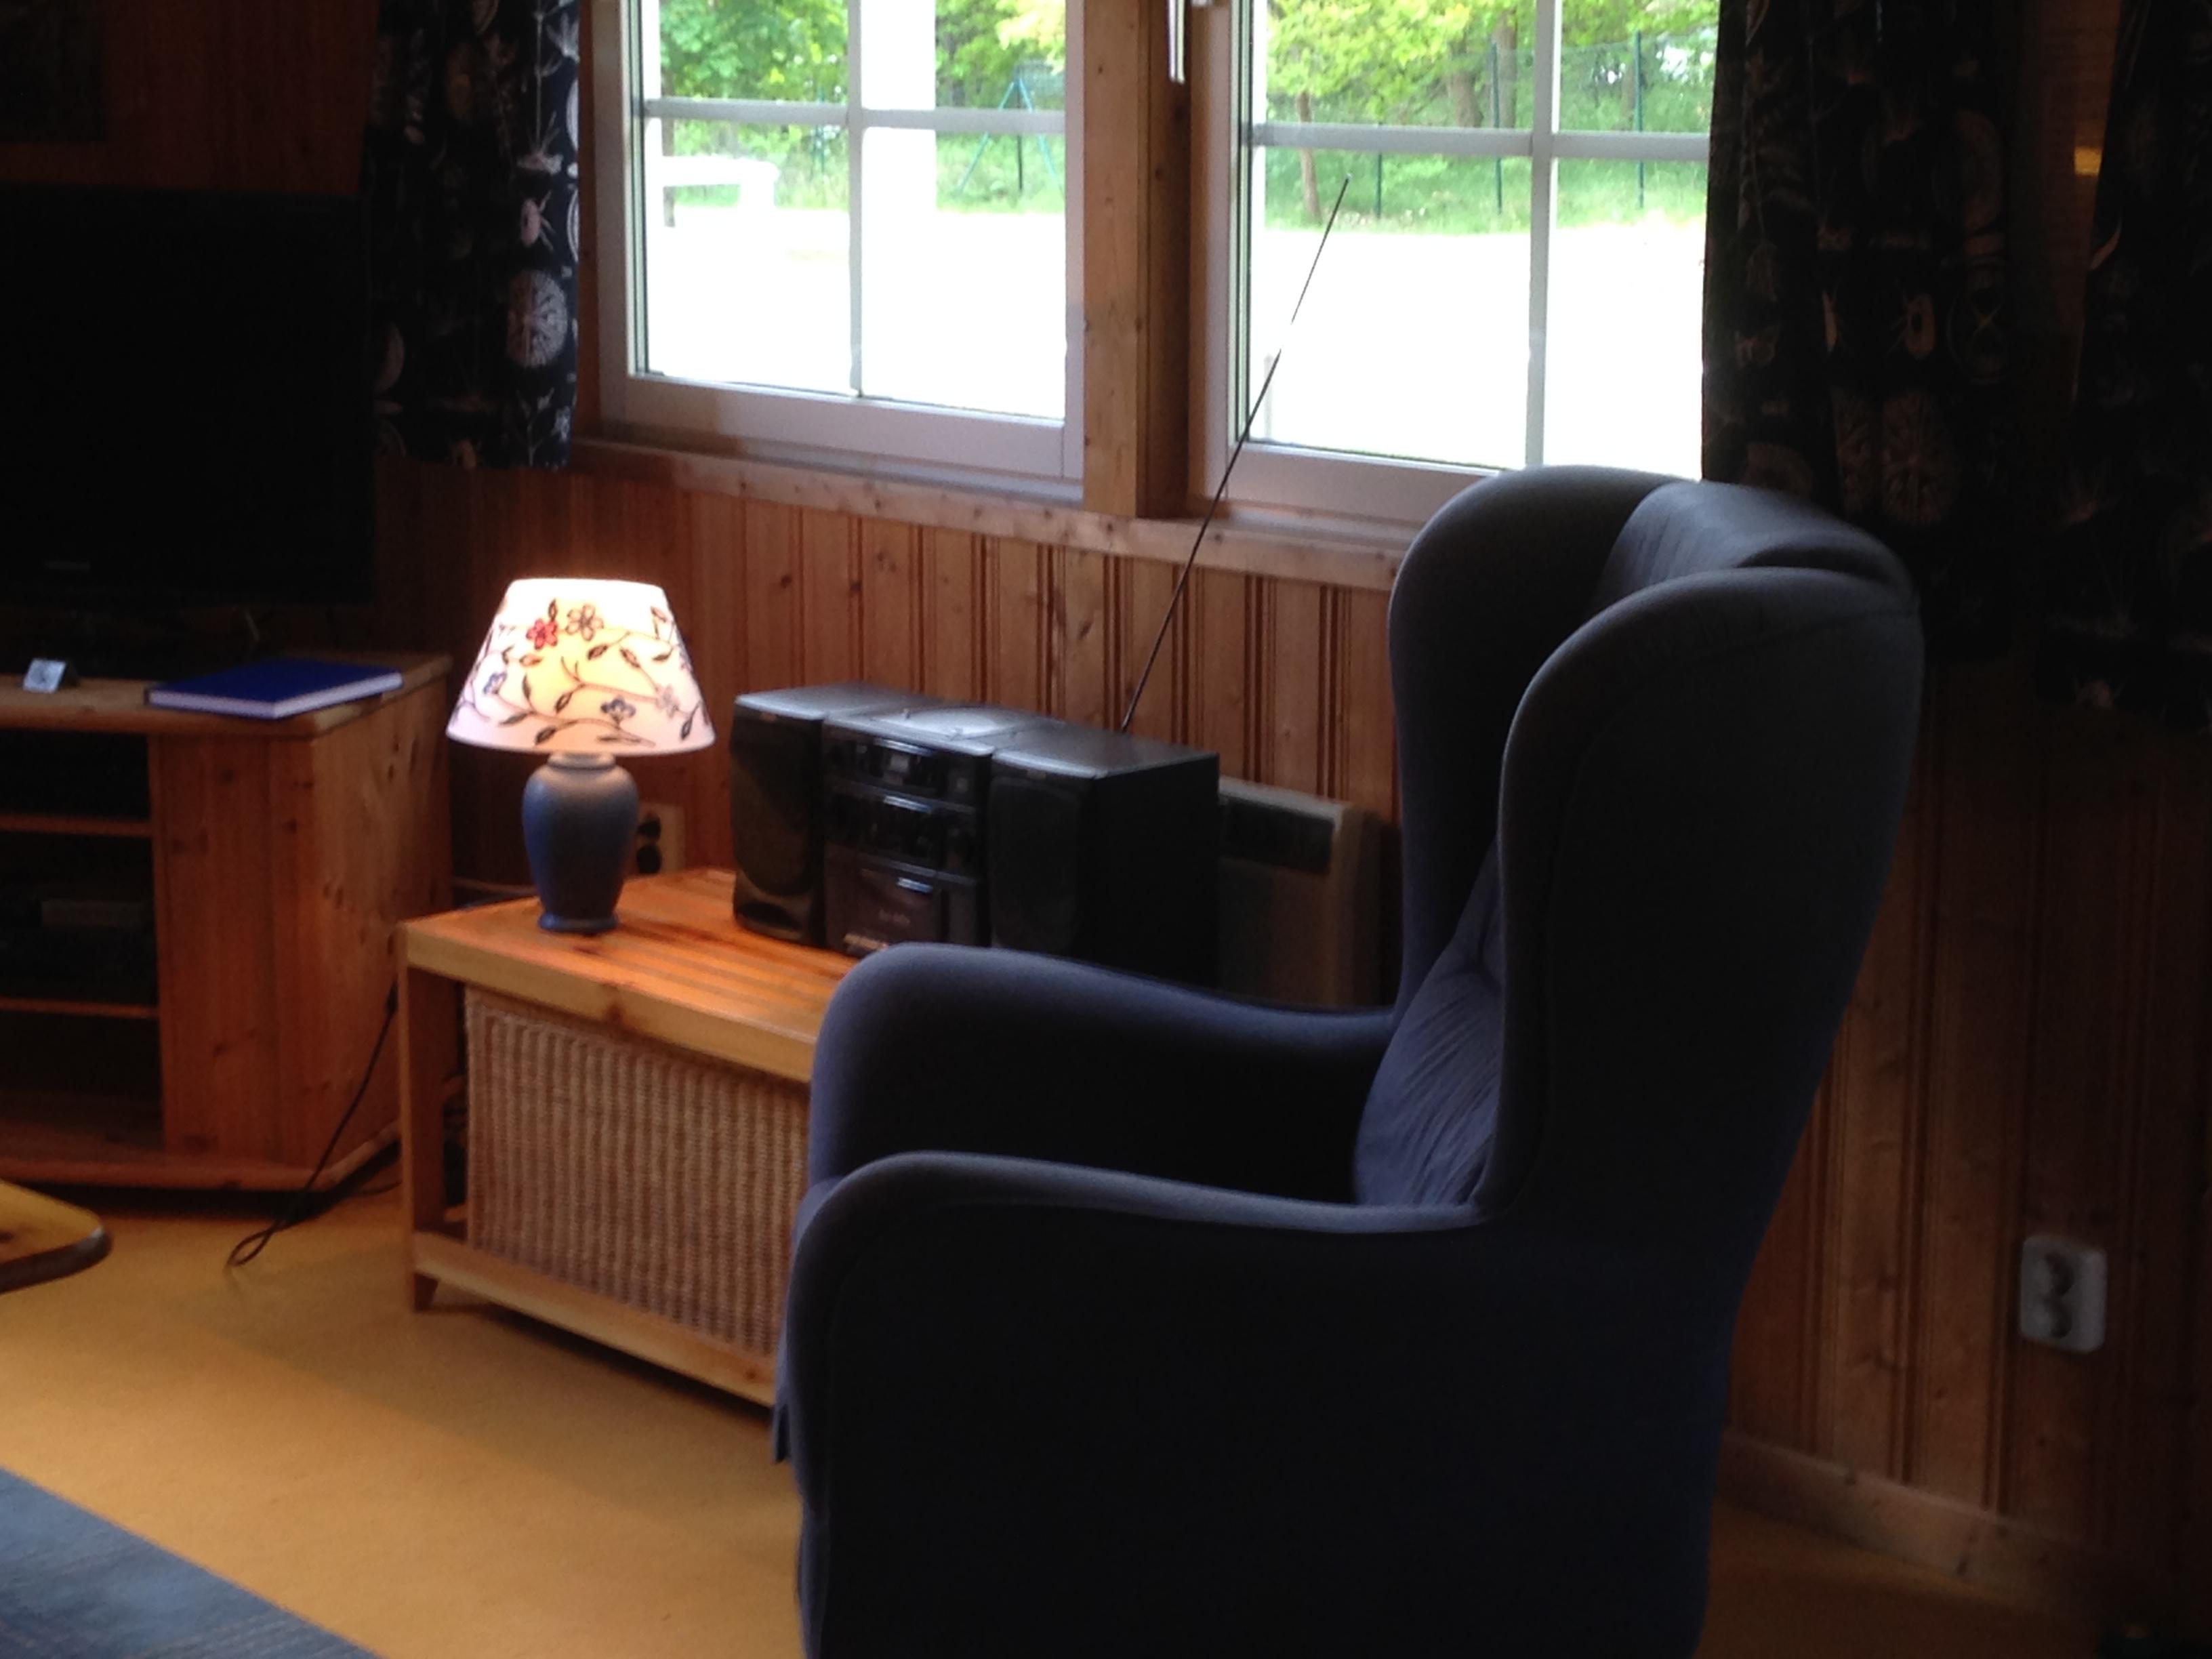 Villa Blau 2 Boote Kamin 4 Schlafzi Houses For Rent In Userin Mecklenburg Vorpommern Germany